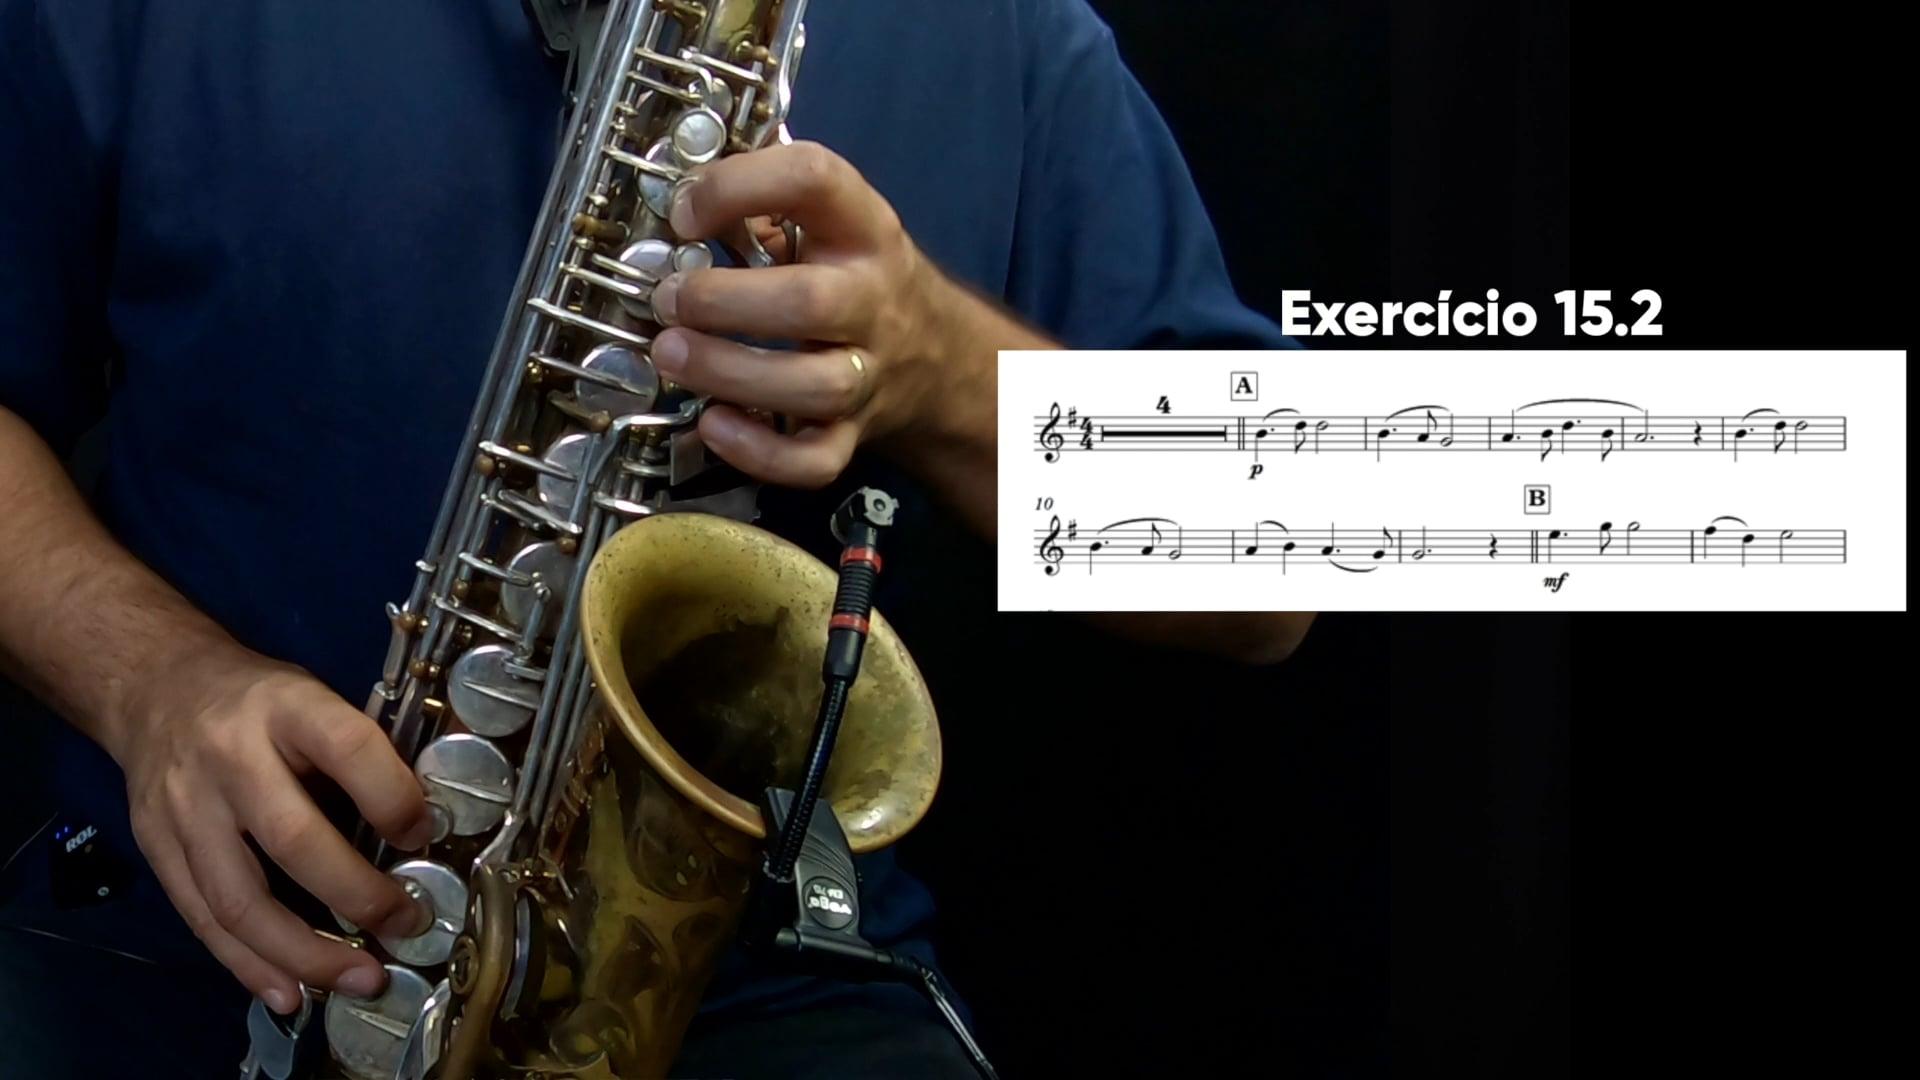 Repertório - Theme From New World Symphony